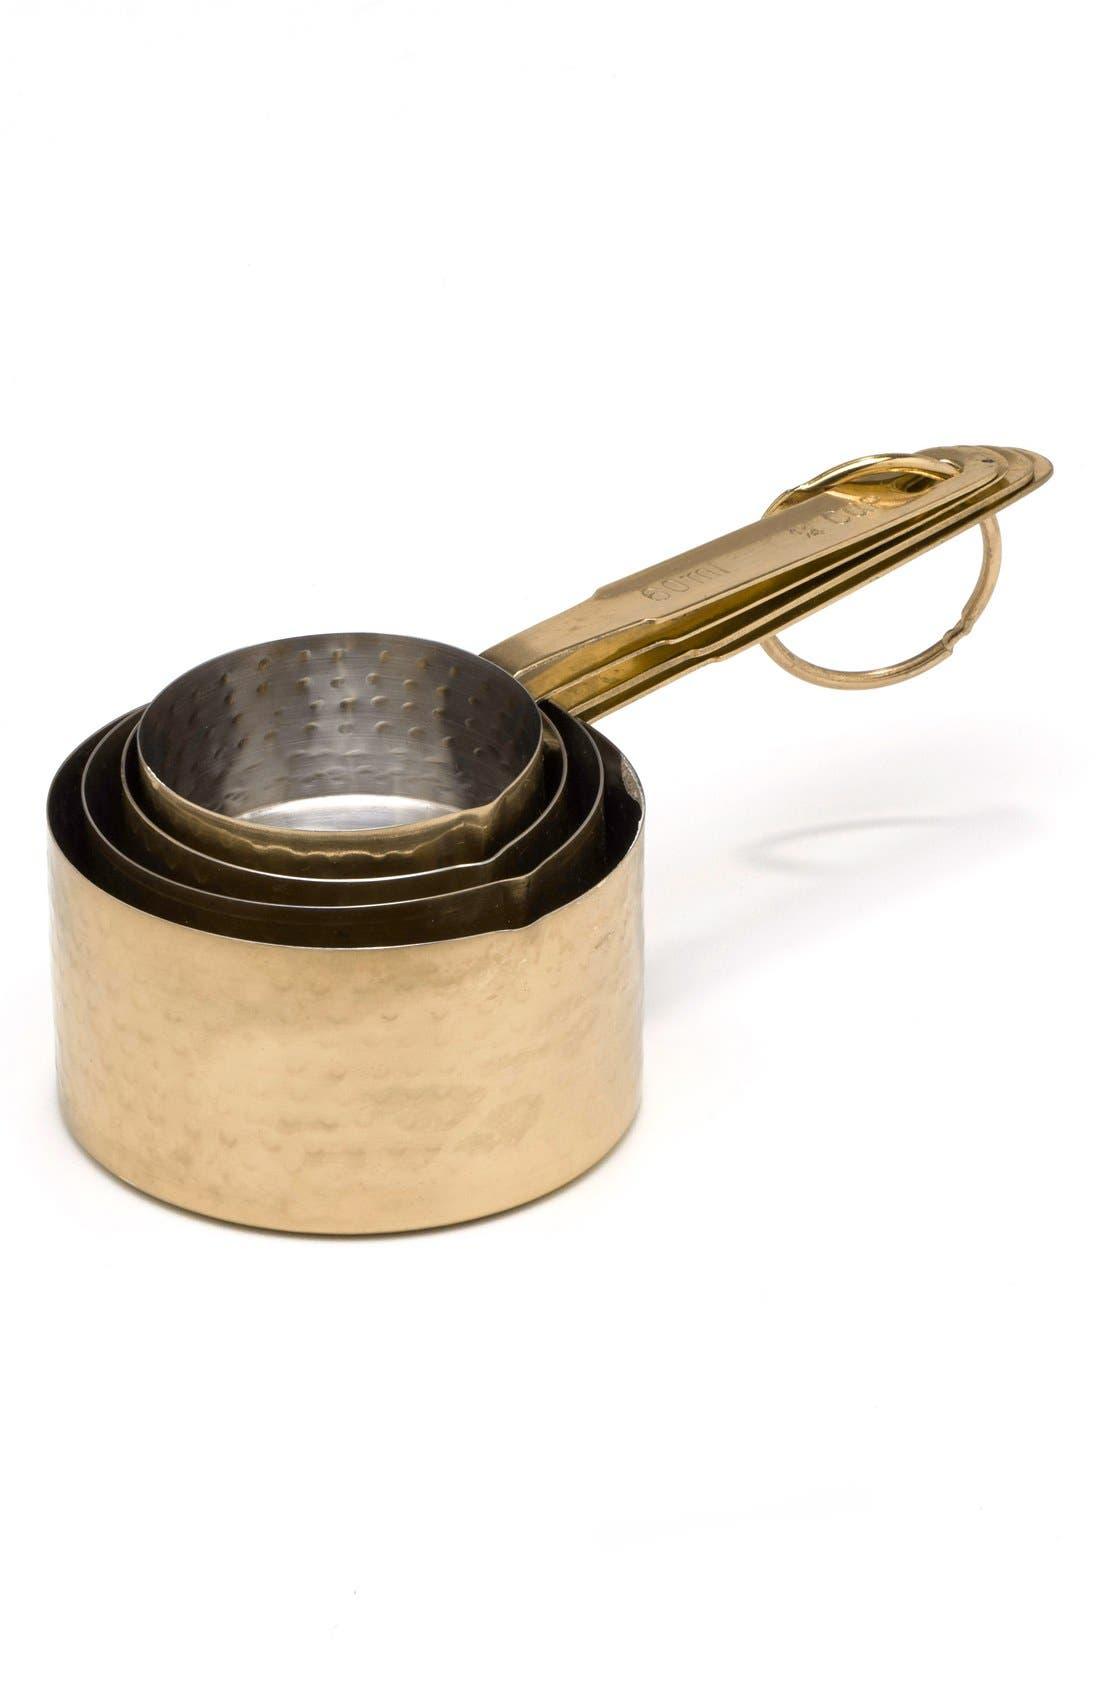 Main Image - Cambridge 4-Piece Measuring Cup Set